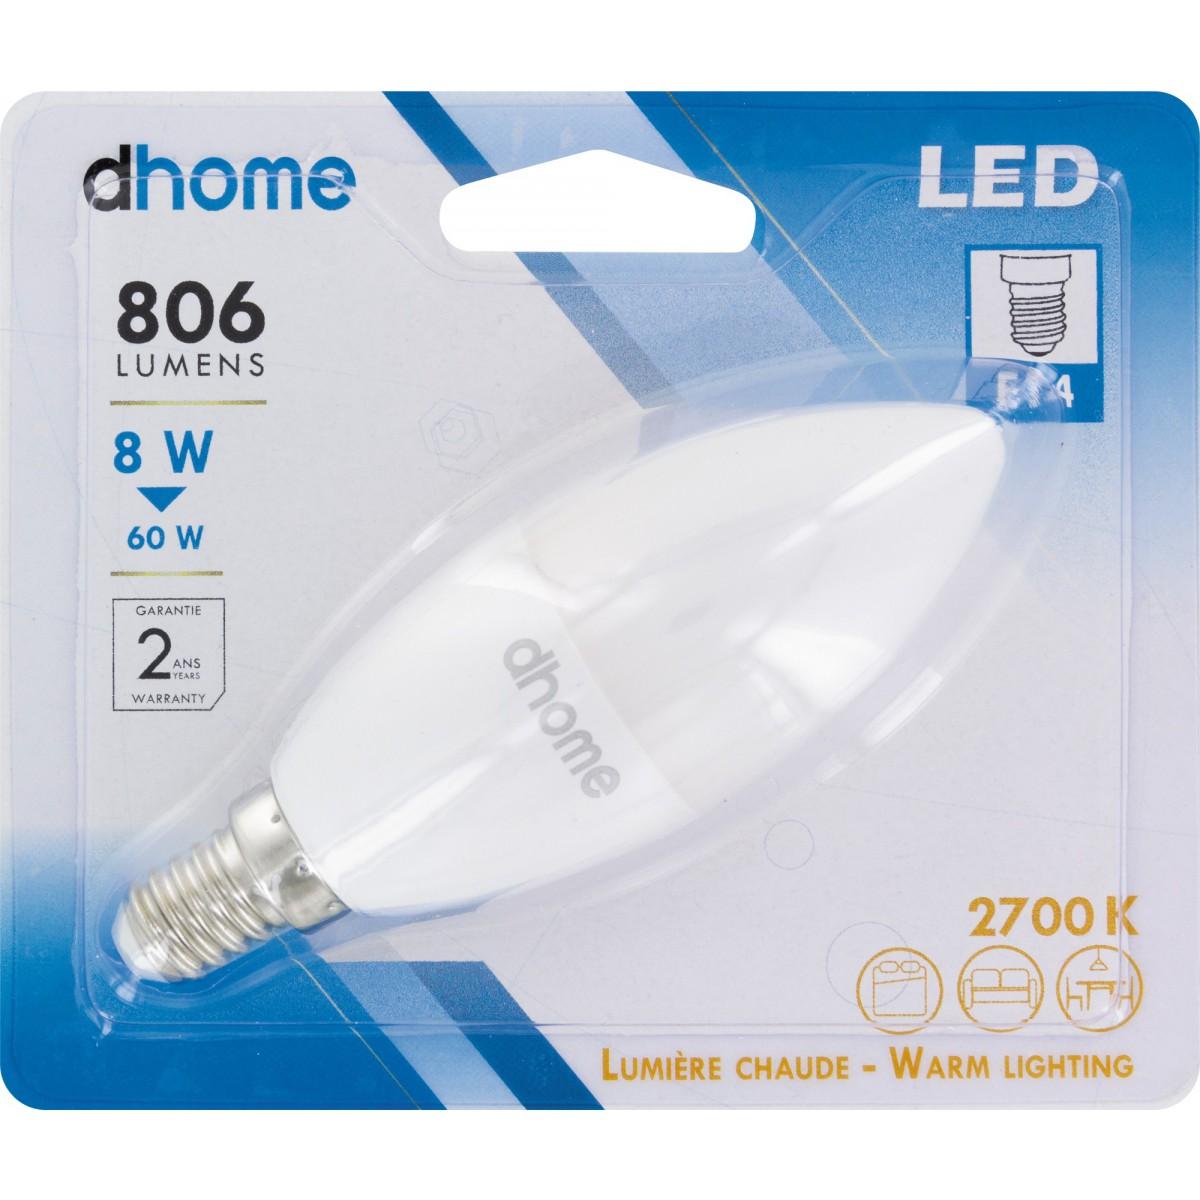 Ampoule LED flamme E14 dhome - 806 Lumens - 8 W - 2700 K